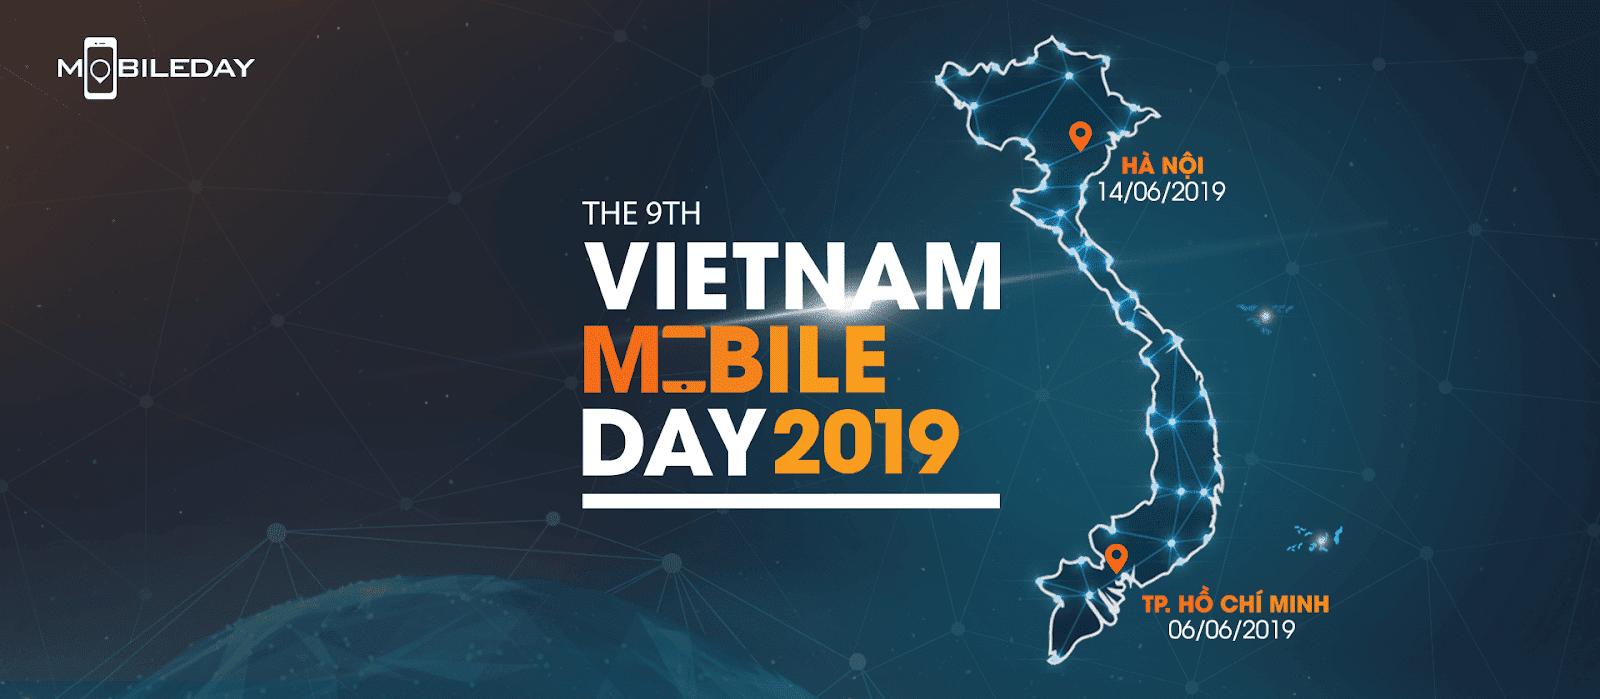 vietnam-mobile-day-2019